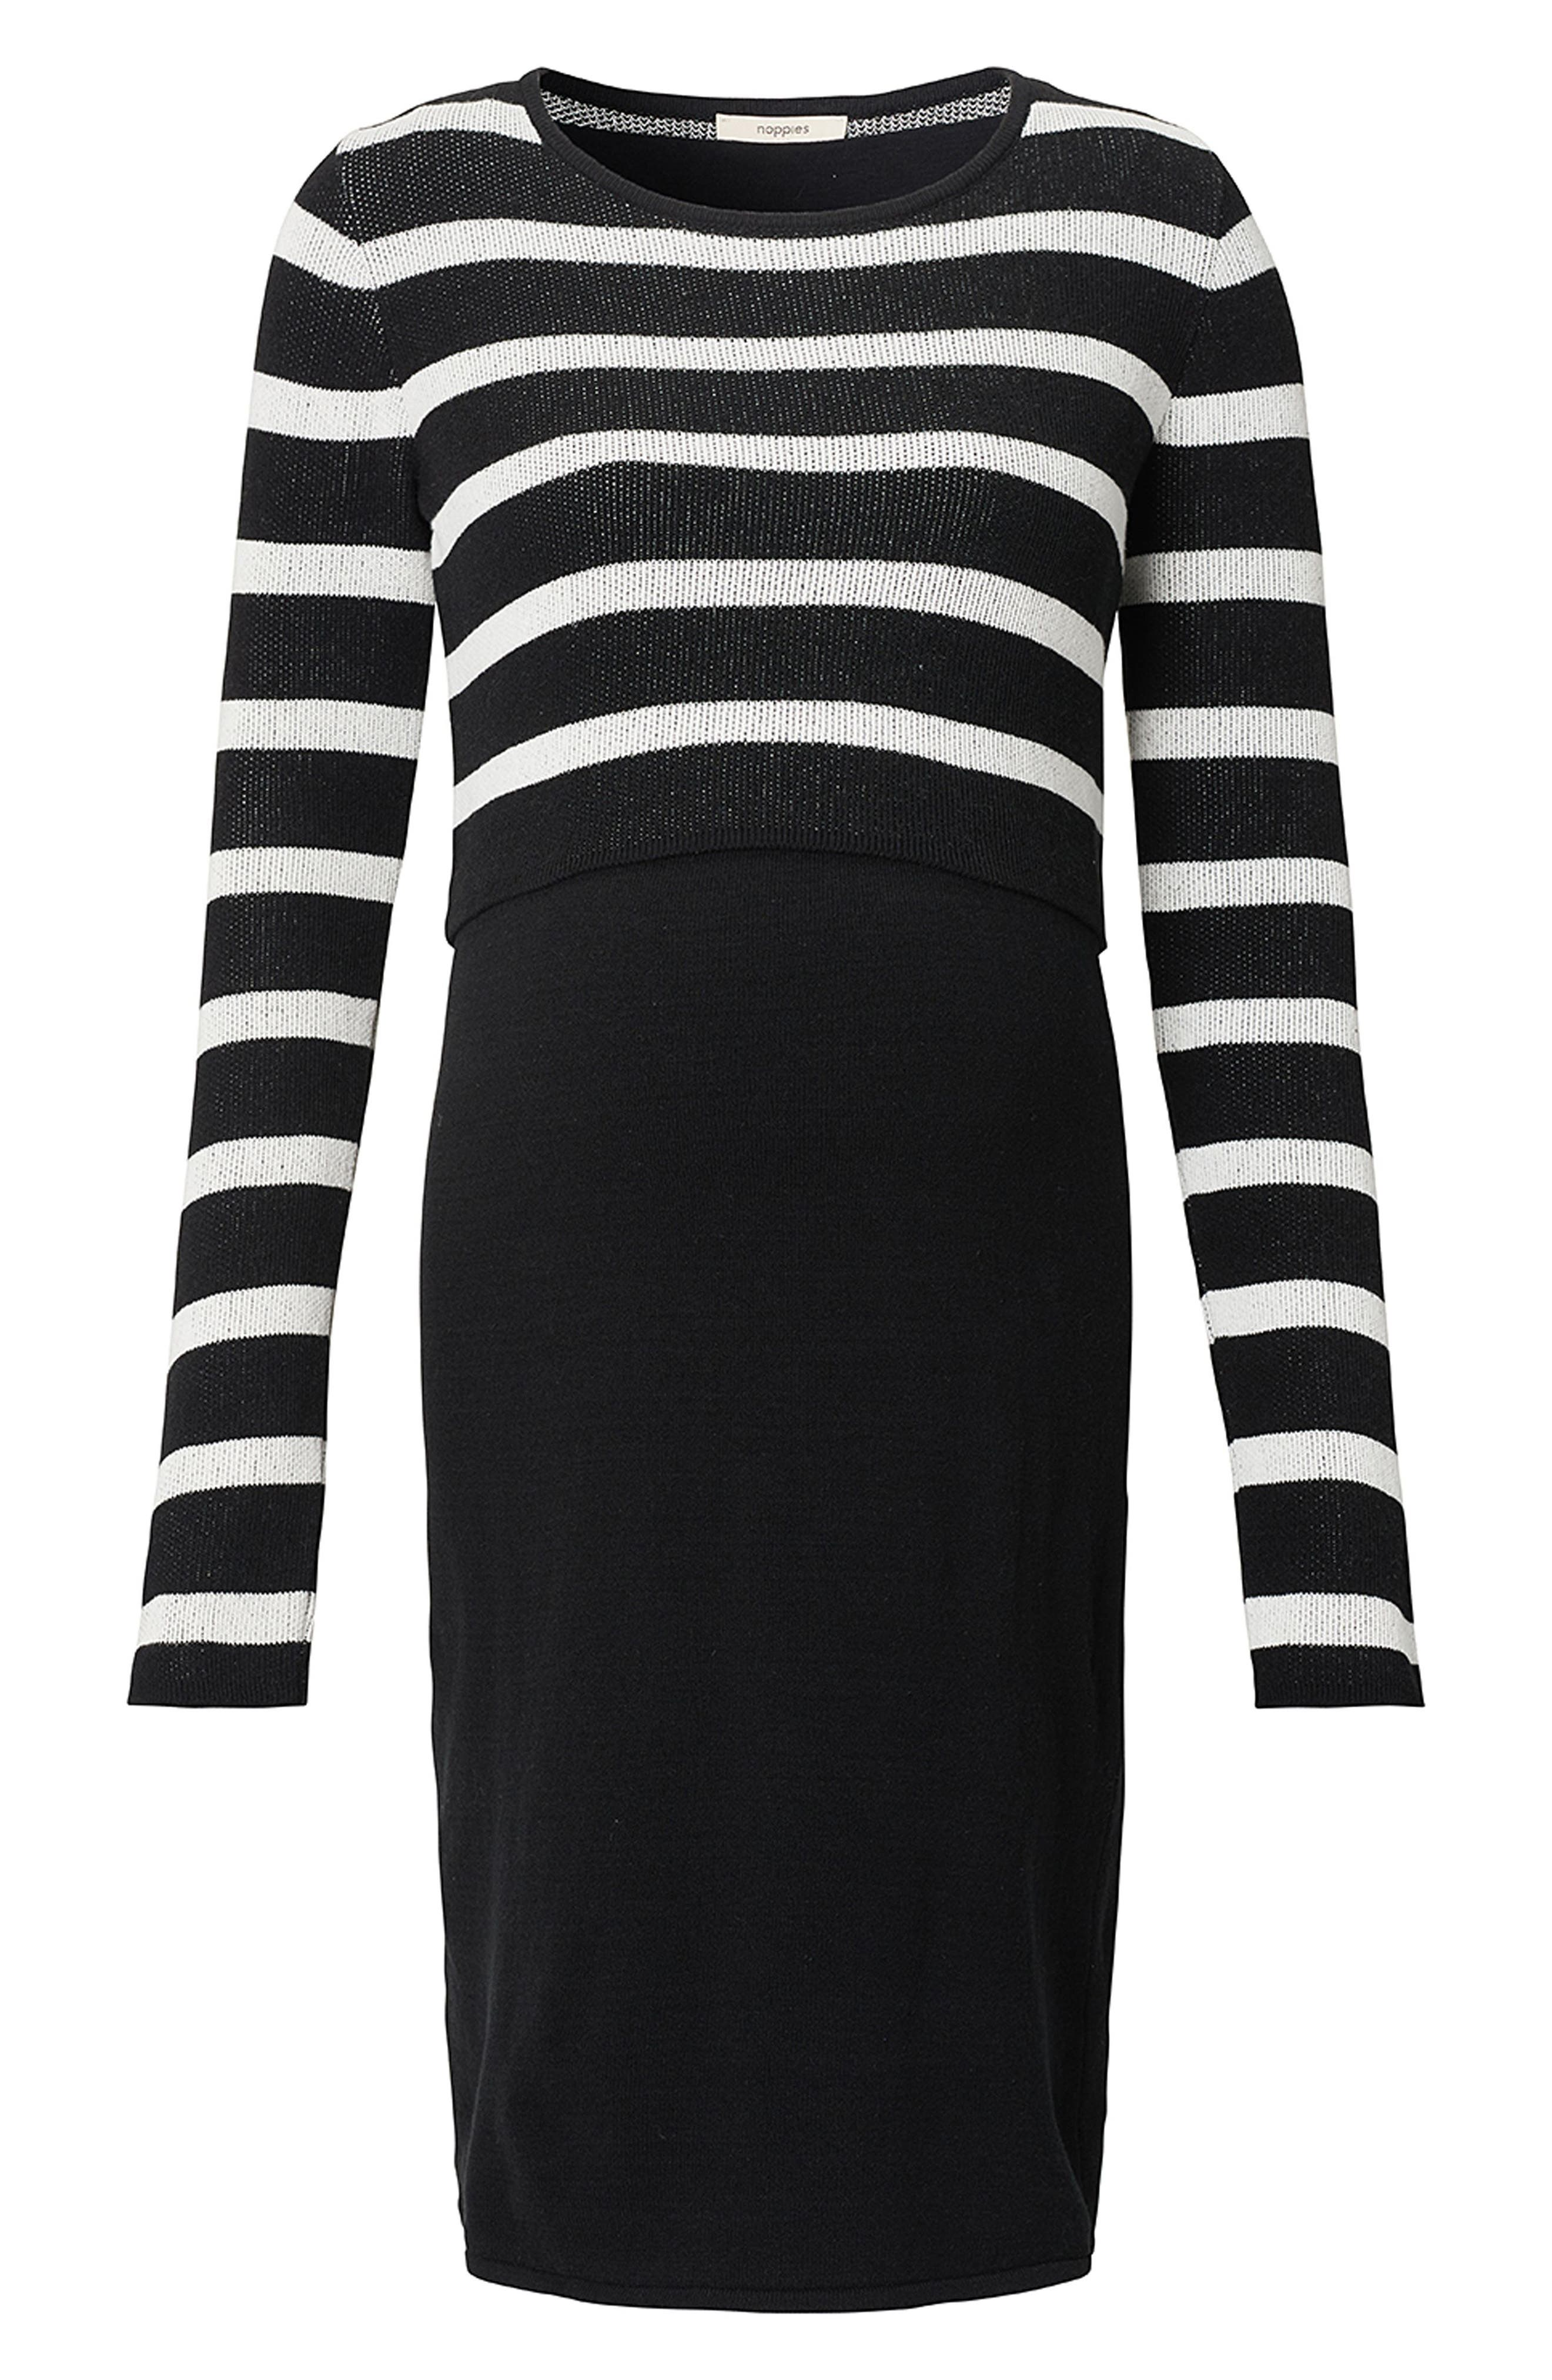 NOPPIES,                             Imara Nursing/Maternity Dress,                             Alternate thumbnail 2, color,                             BLACK